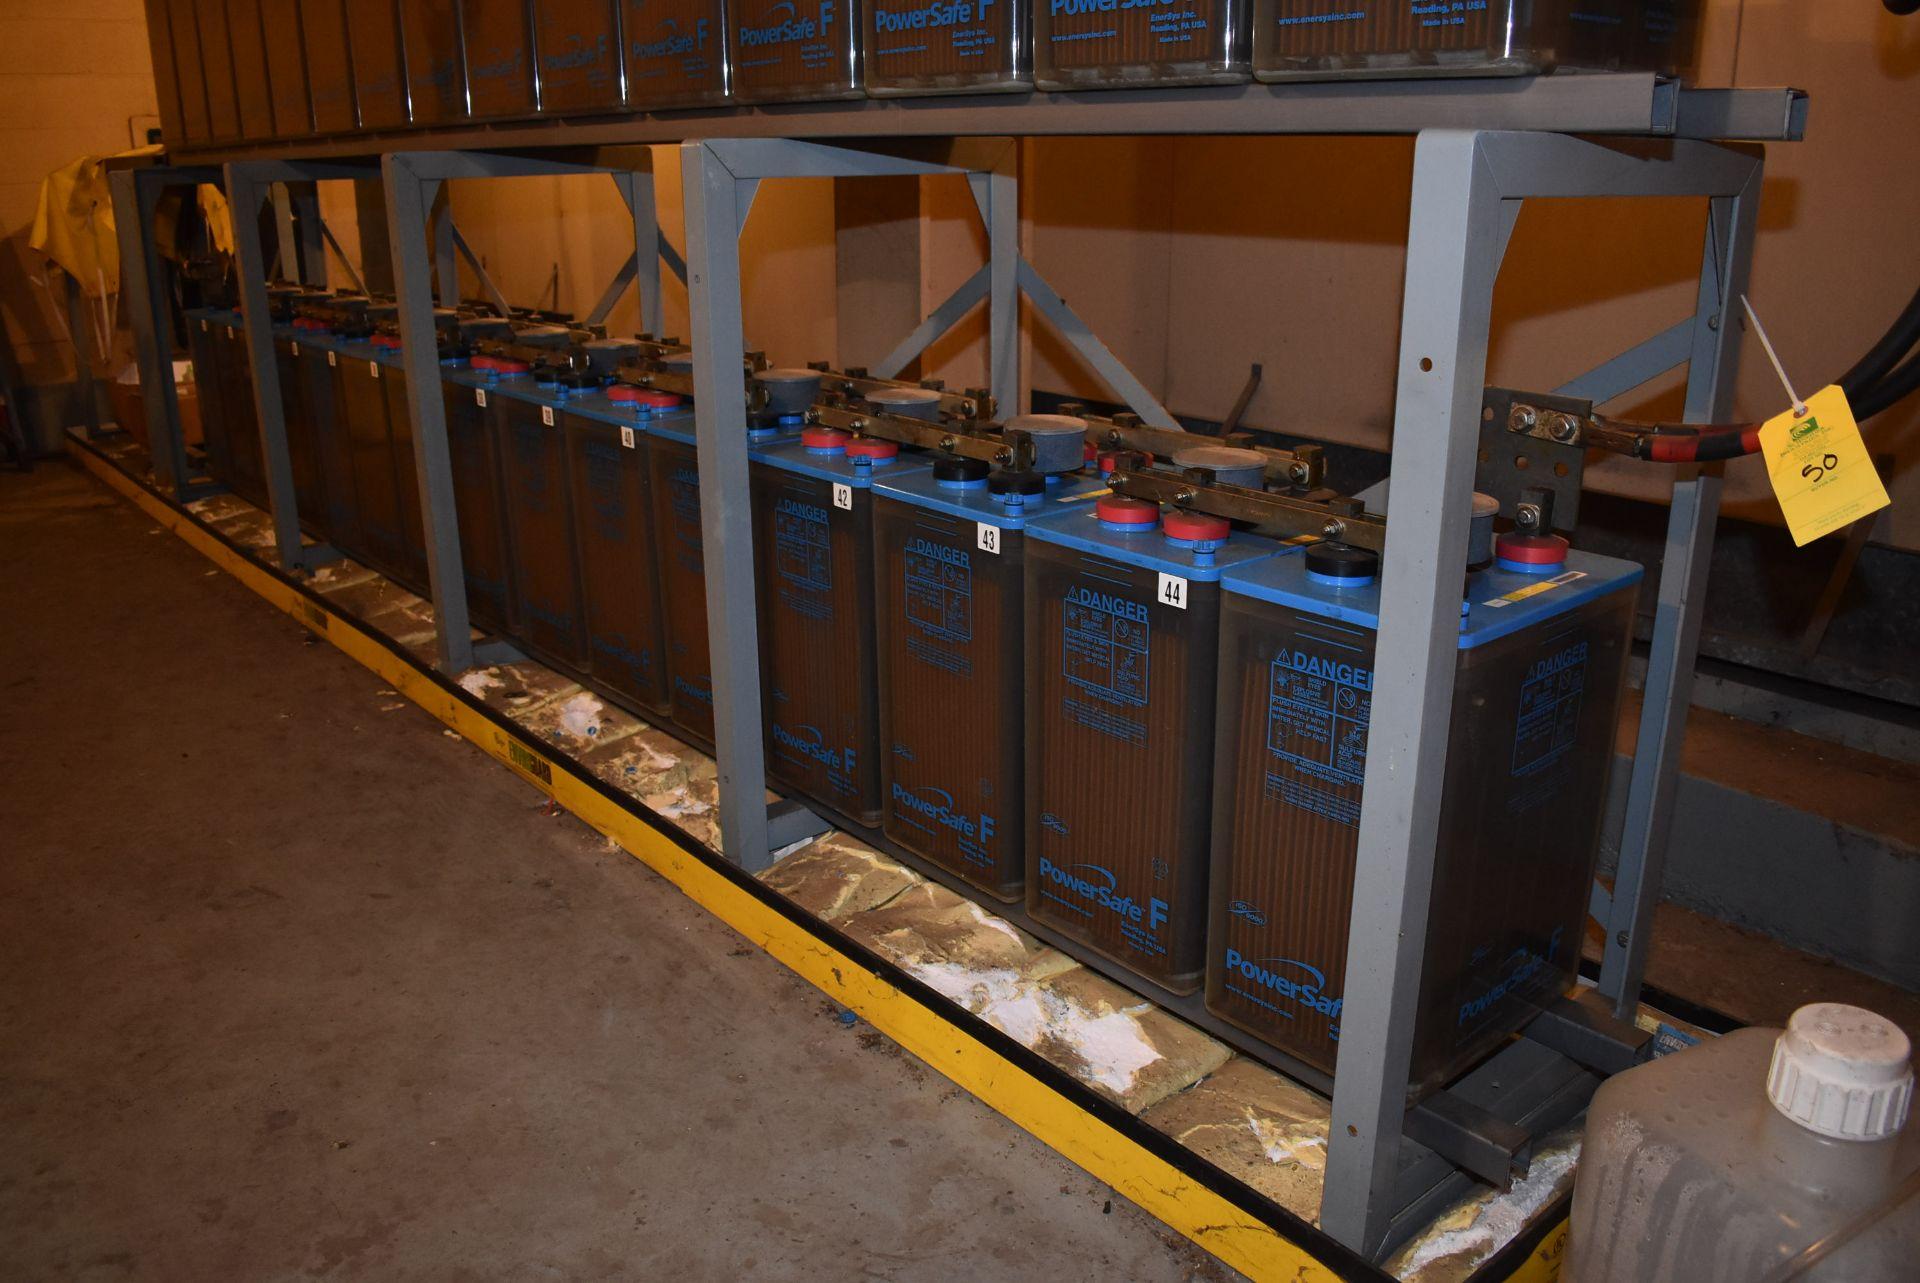 Lot 50 - 2014 Power Safe Type FTA-21P Nom-Capacity 1680 Amps/HR (1-Bank of 15)